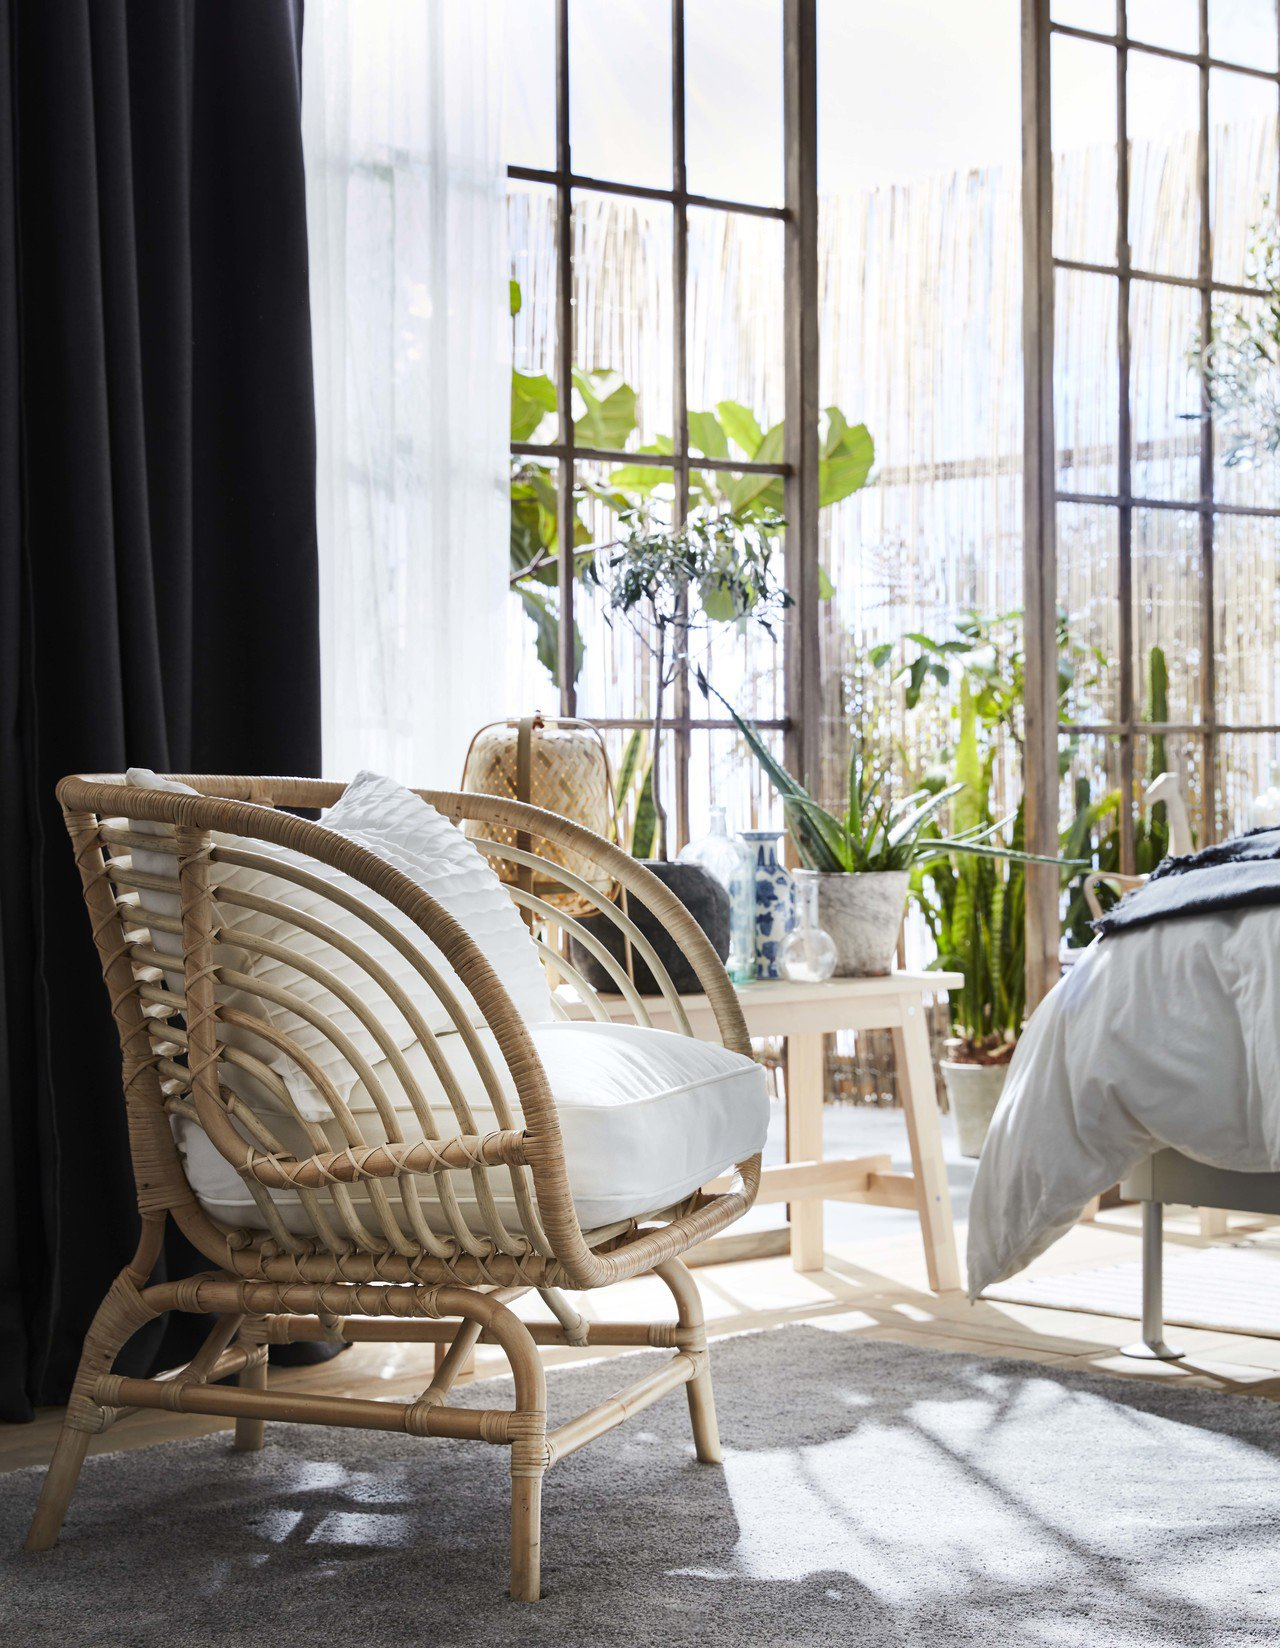 BUSKBO藤製扶手椅,售價3,490元。圖/IKEA提供